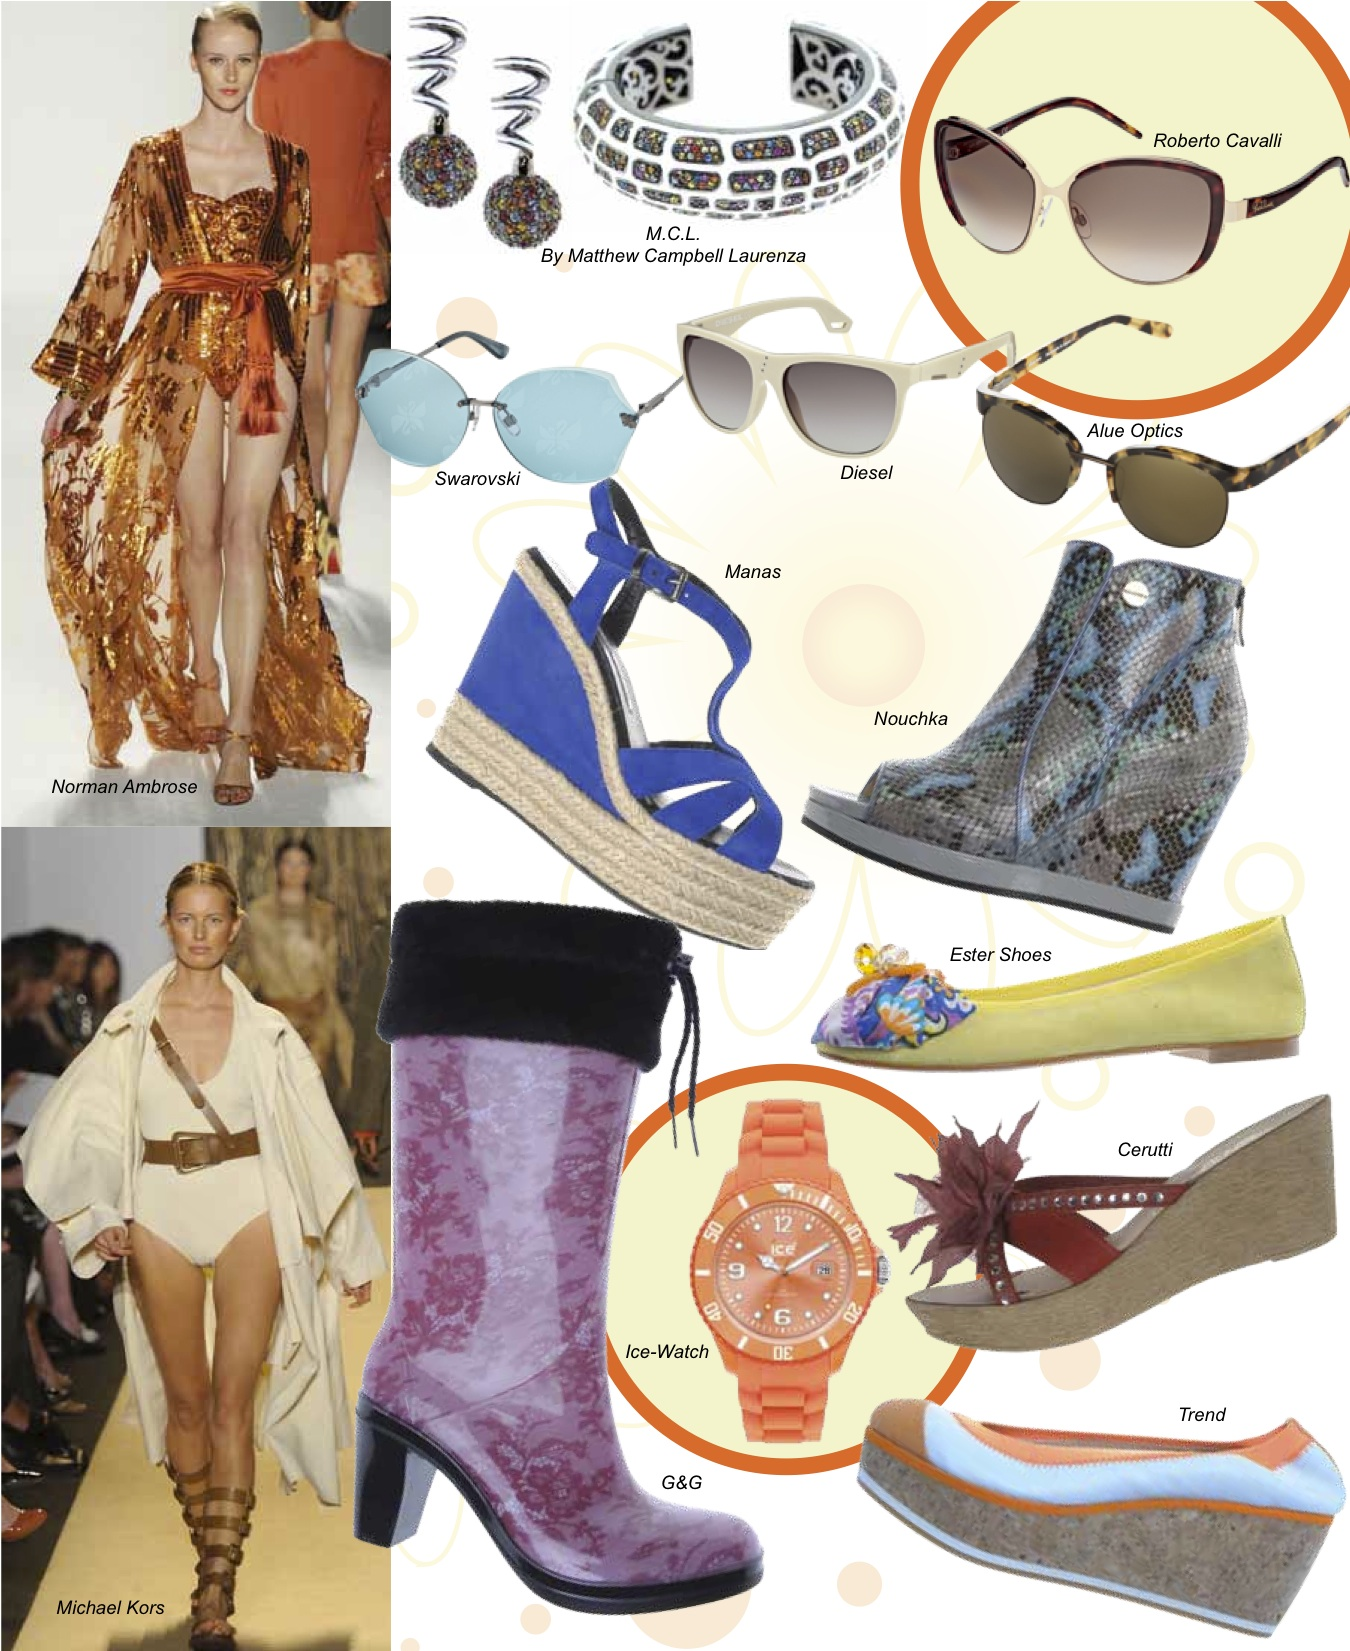 alue-optics-one-sunglasses-Focus-on-Fashion-Retail-12-11